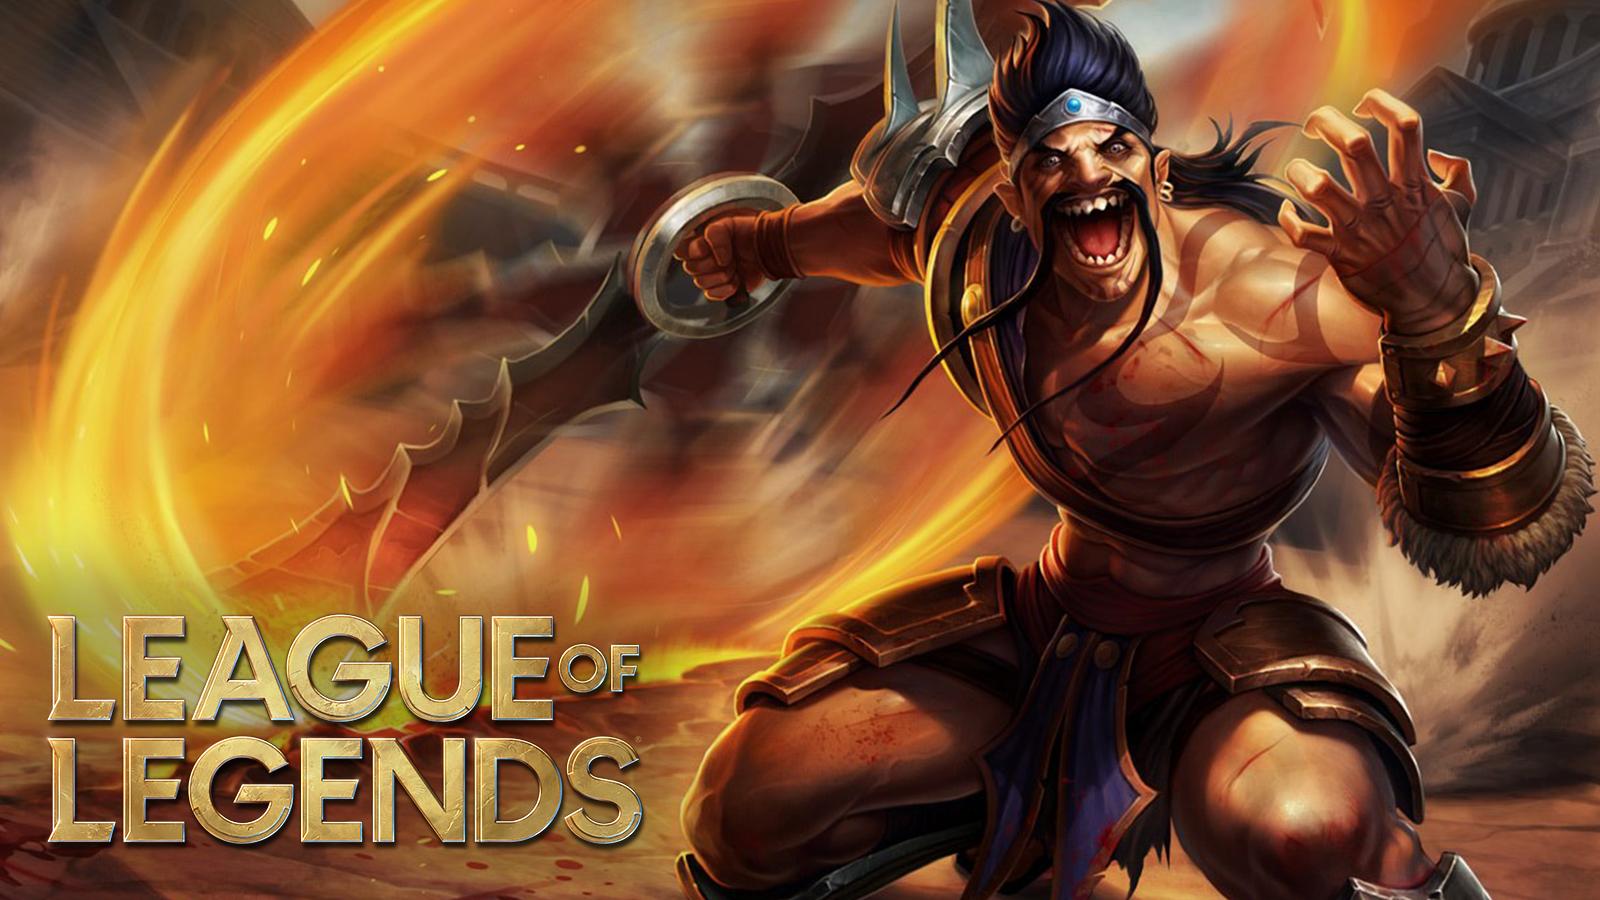 Draven con el logo de League of Legends